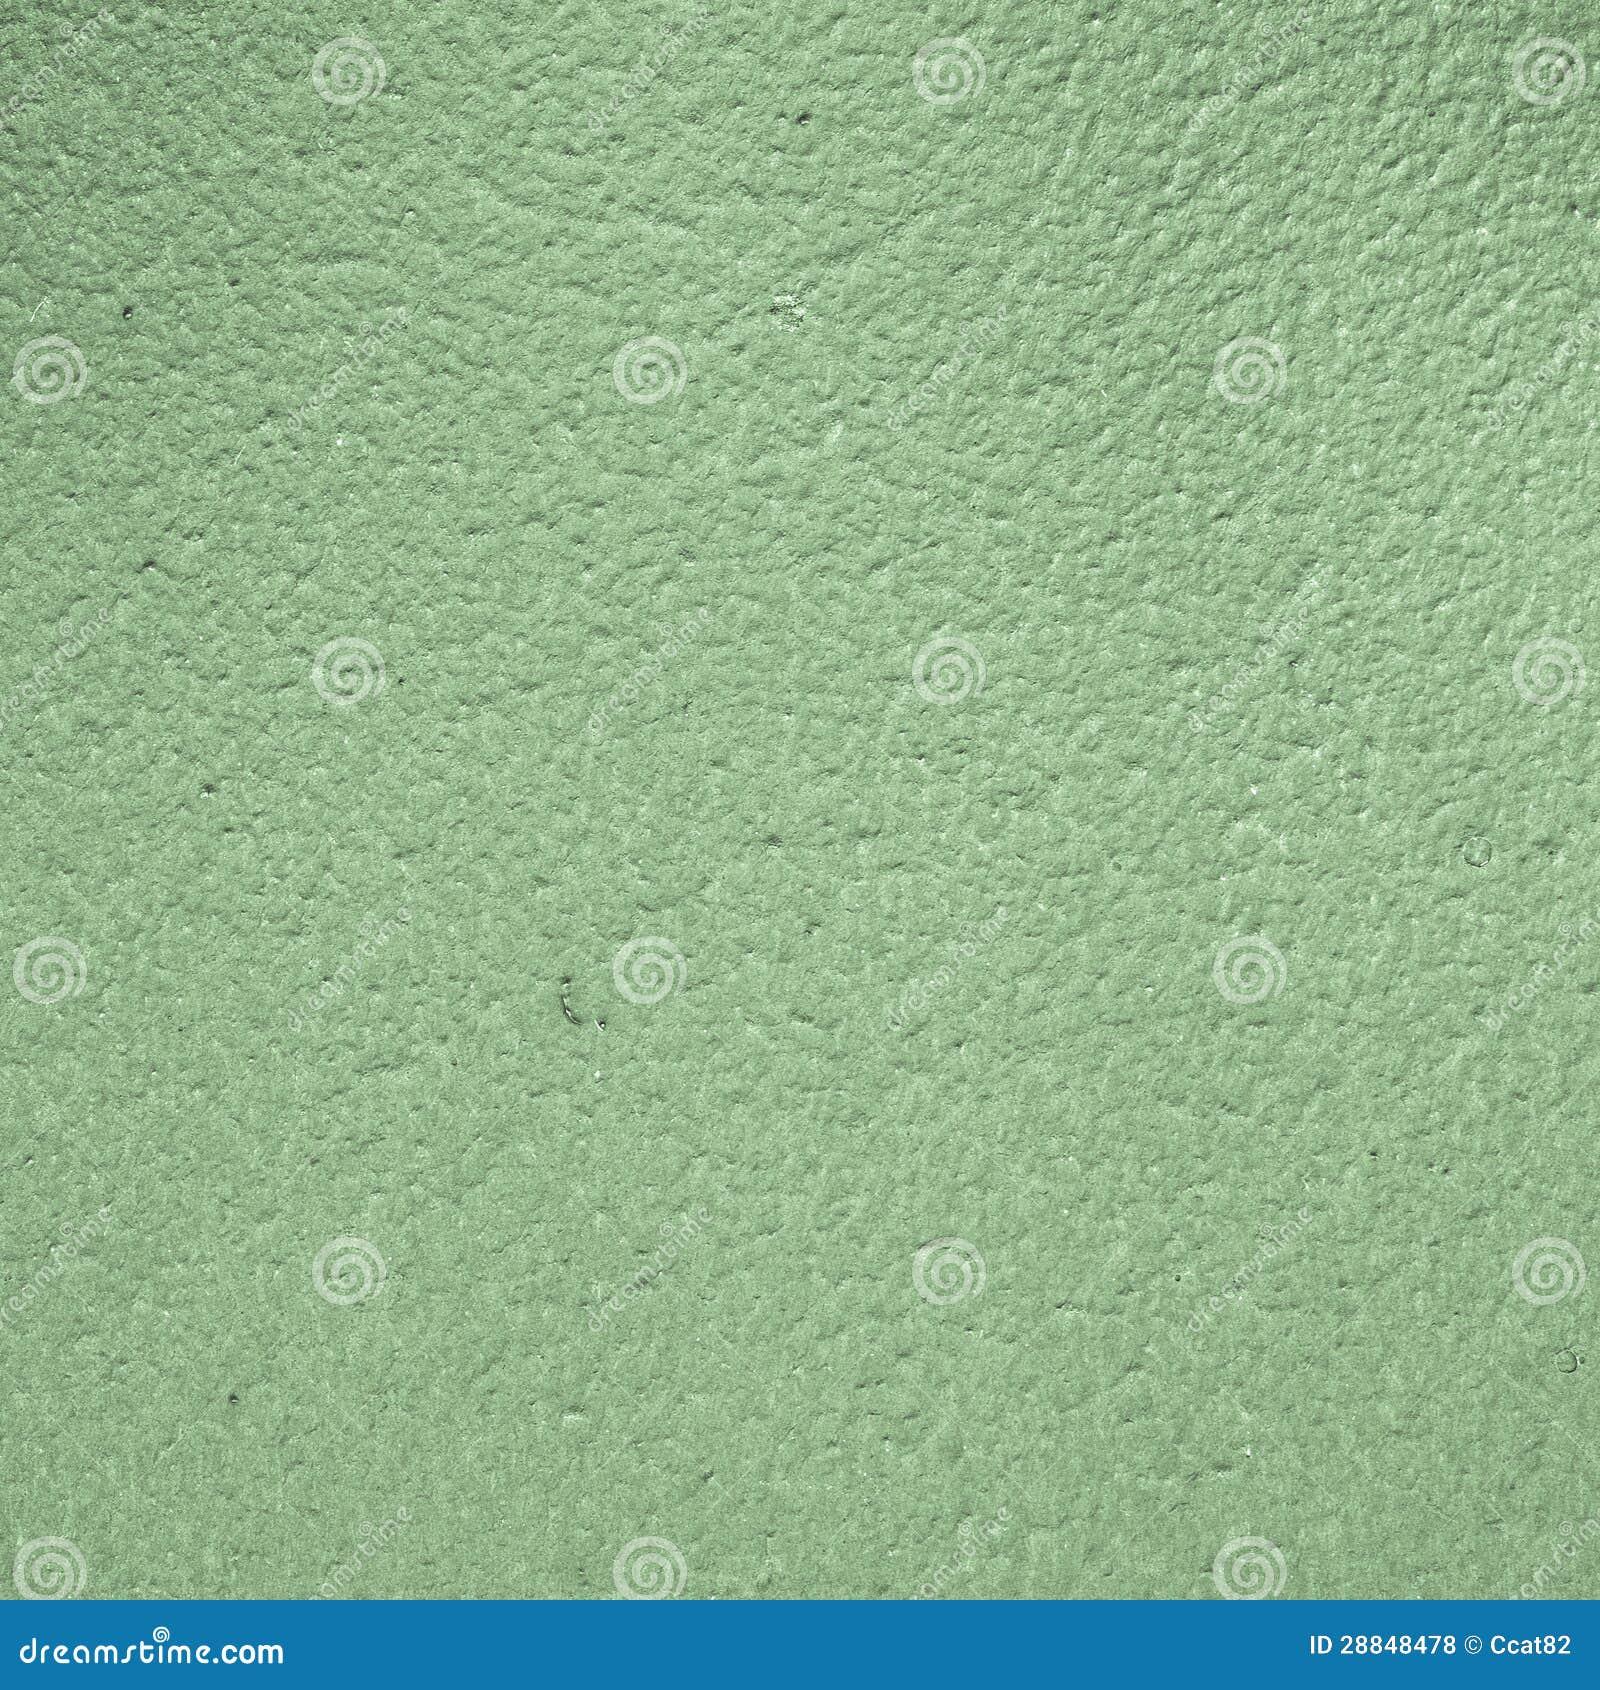 aquamarine surface stock photo image of dirty crayon 28848478